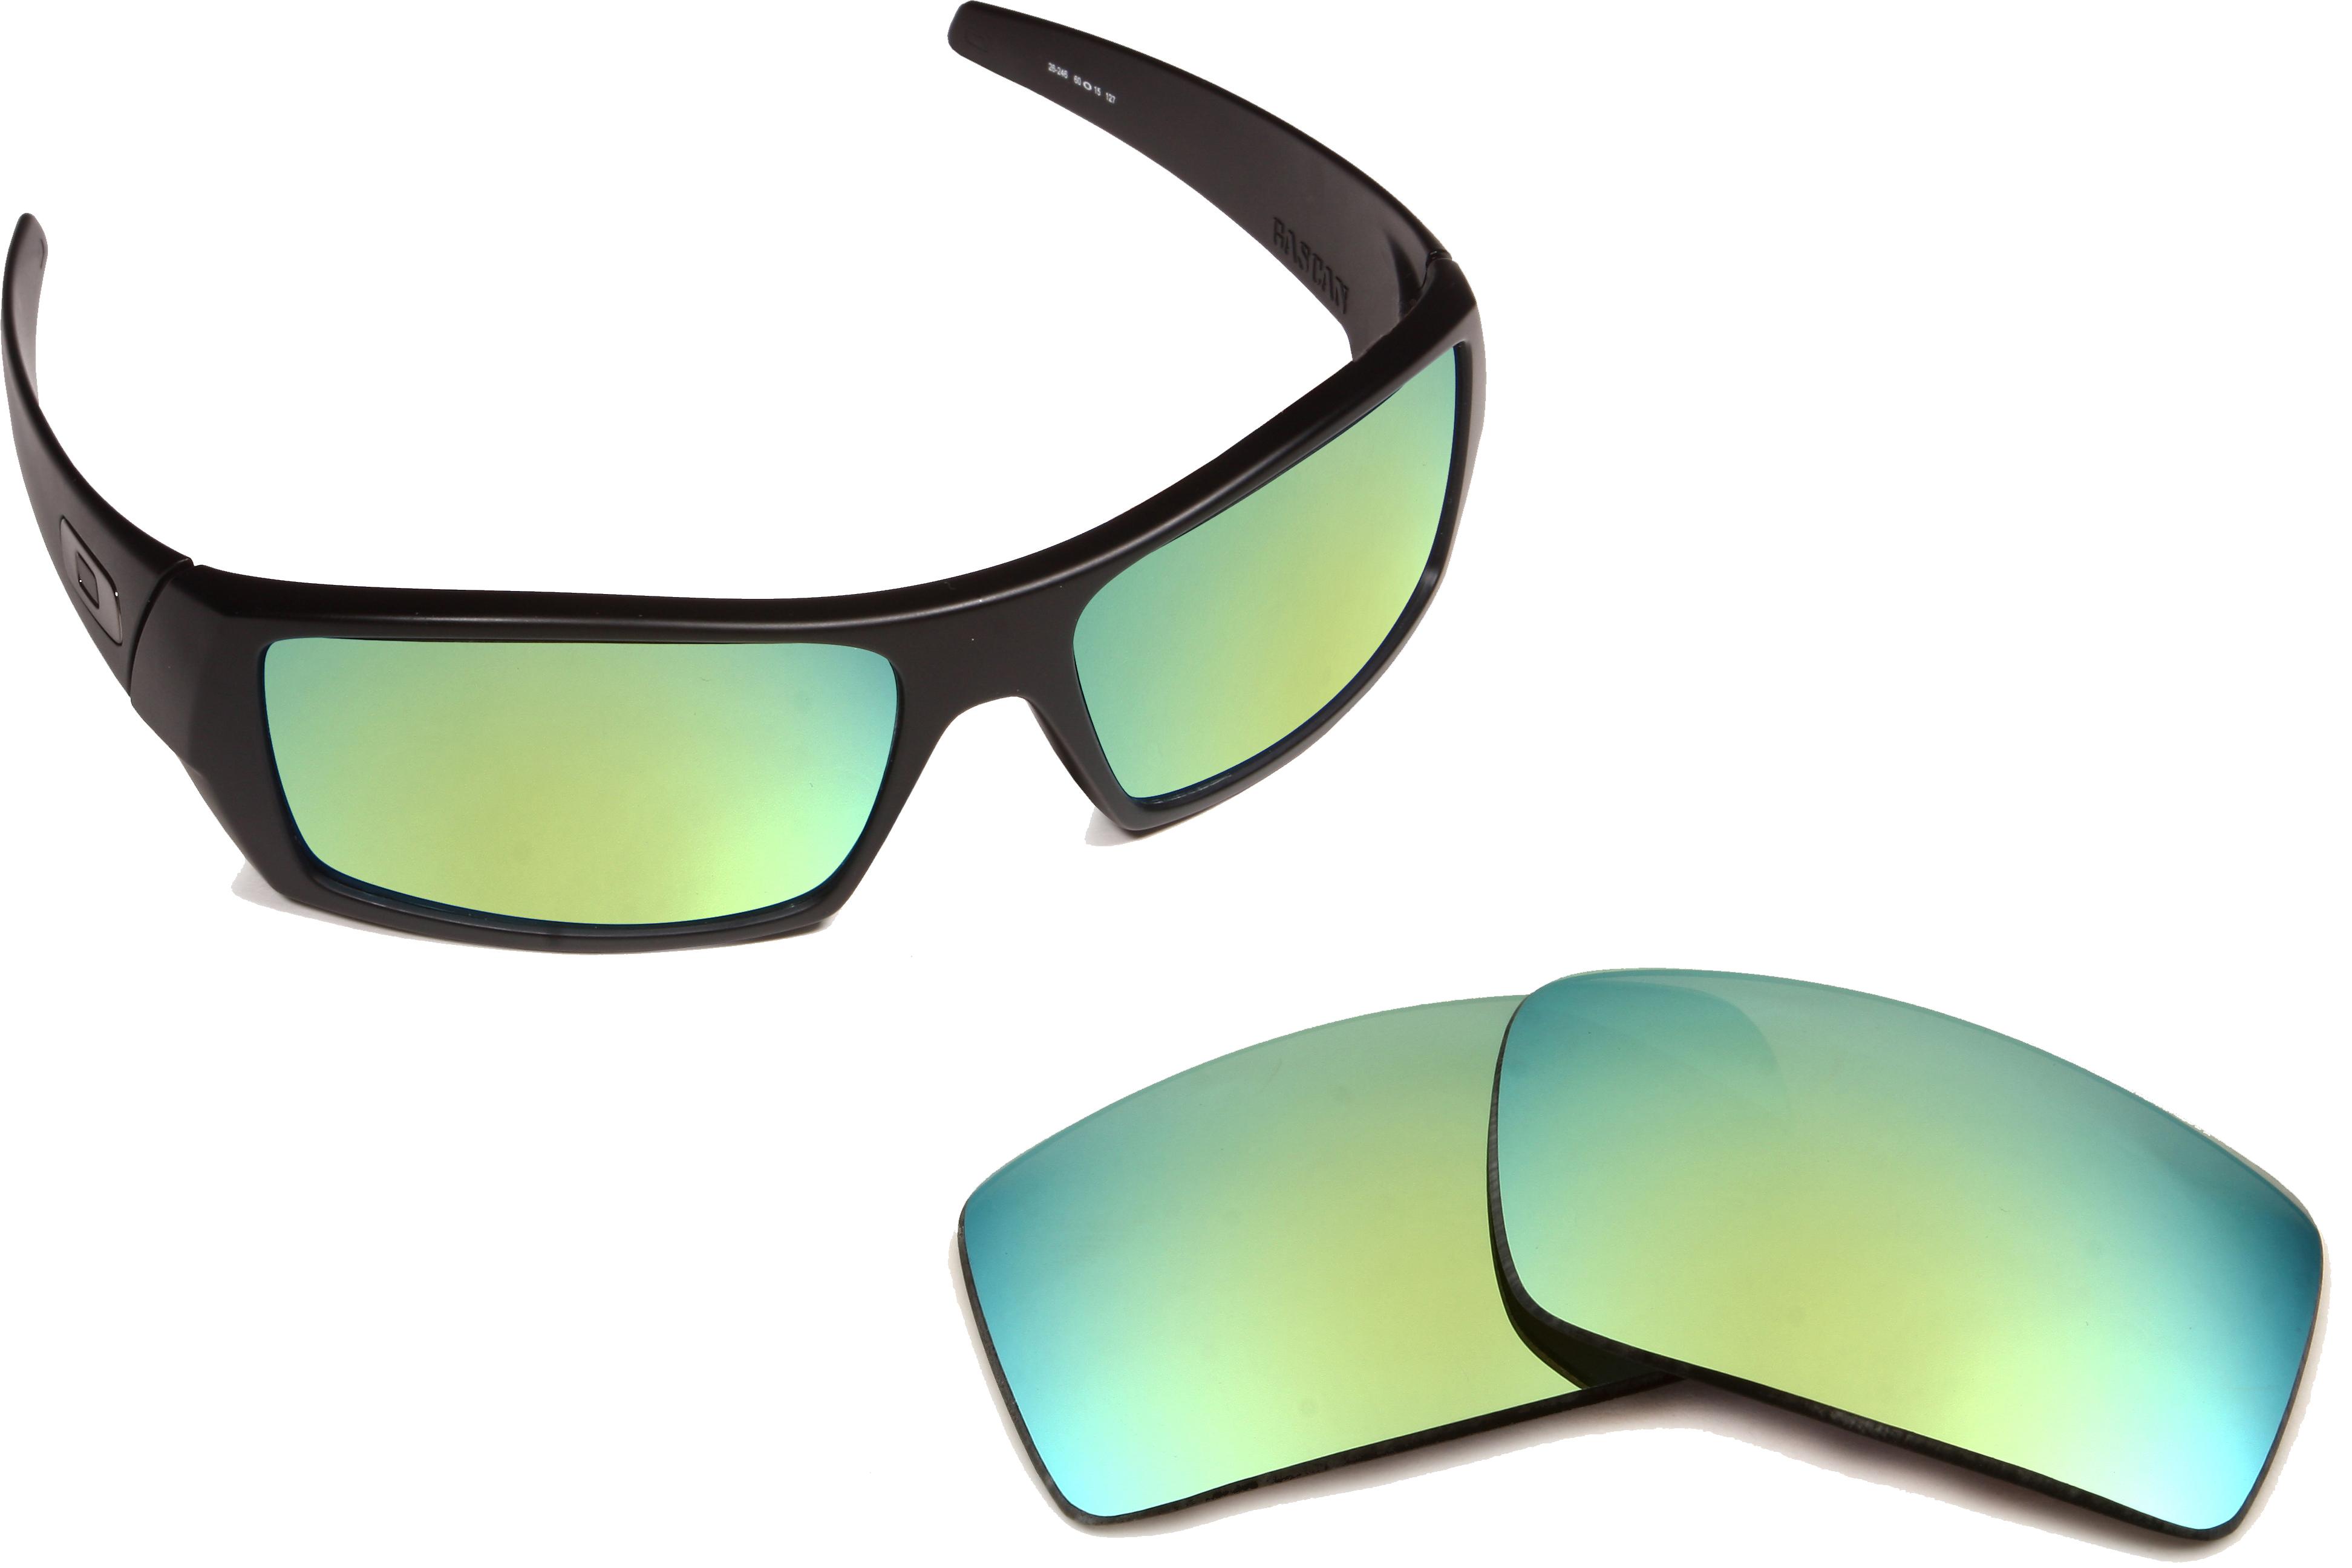 Seek Optics - New SEEK Replacement Lenses for Oakley Sunglasses GASCAN -  Multiple Options - Walmart.com 27c0b5c256cf